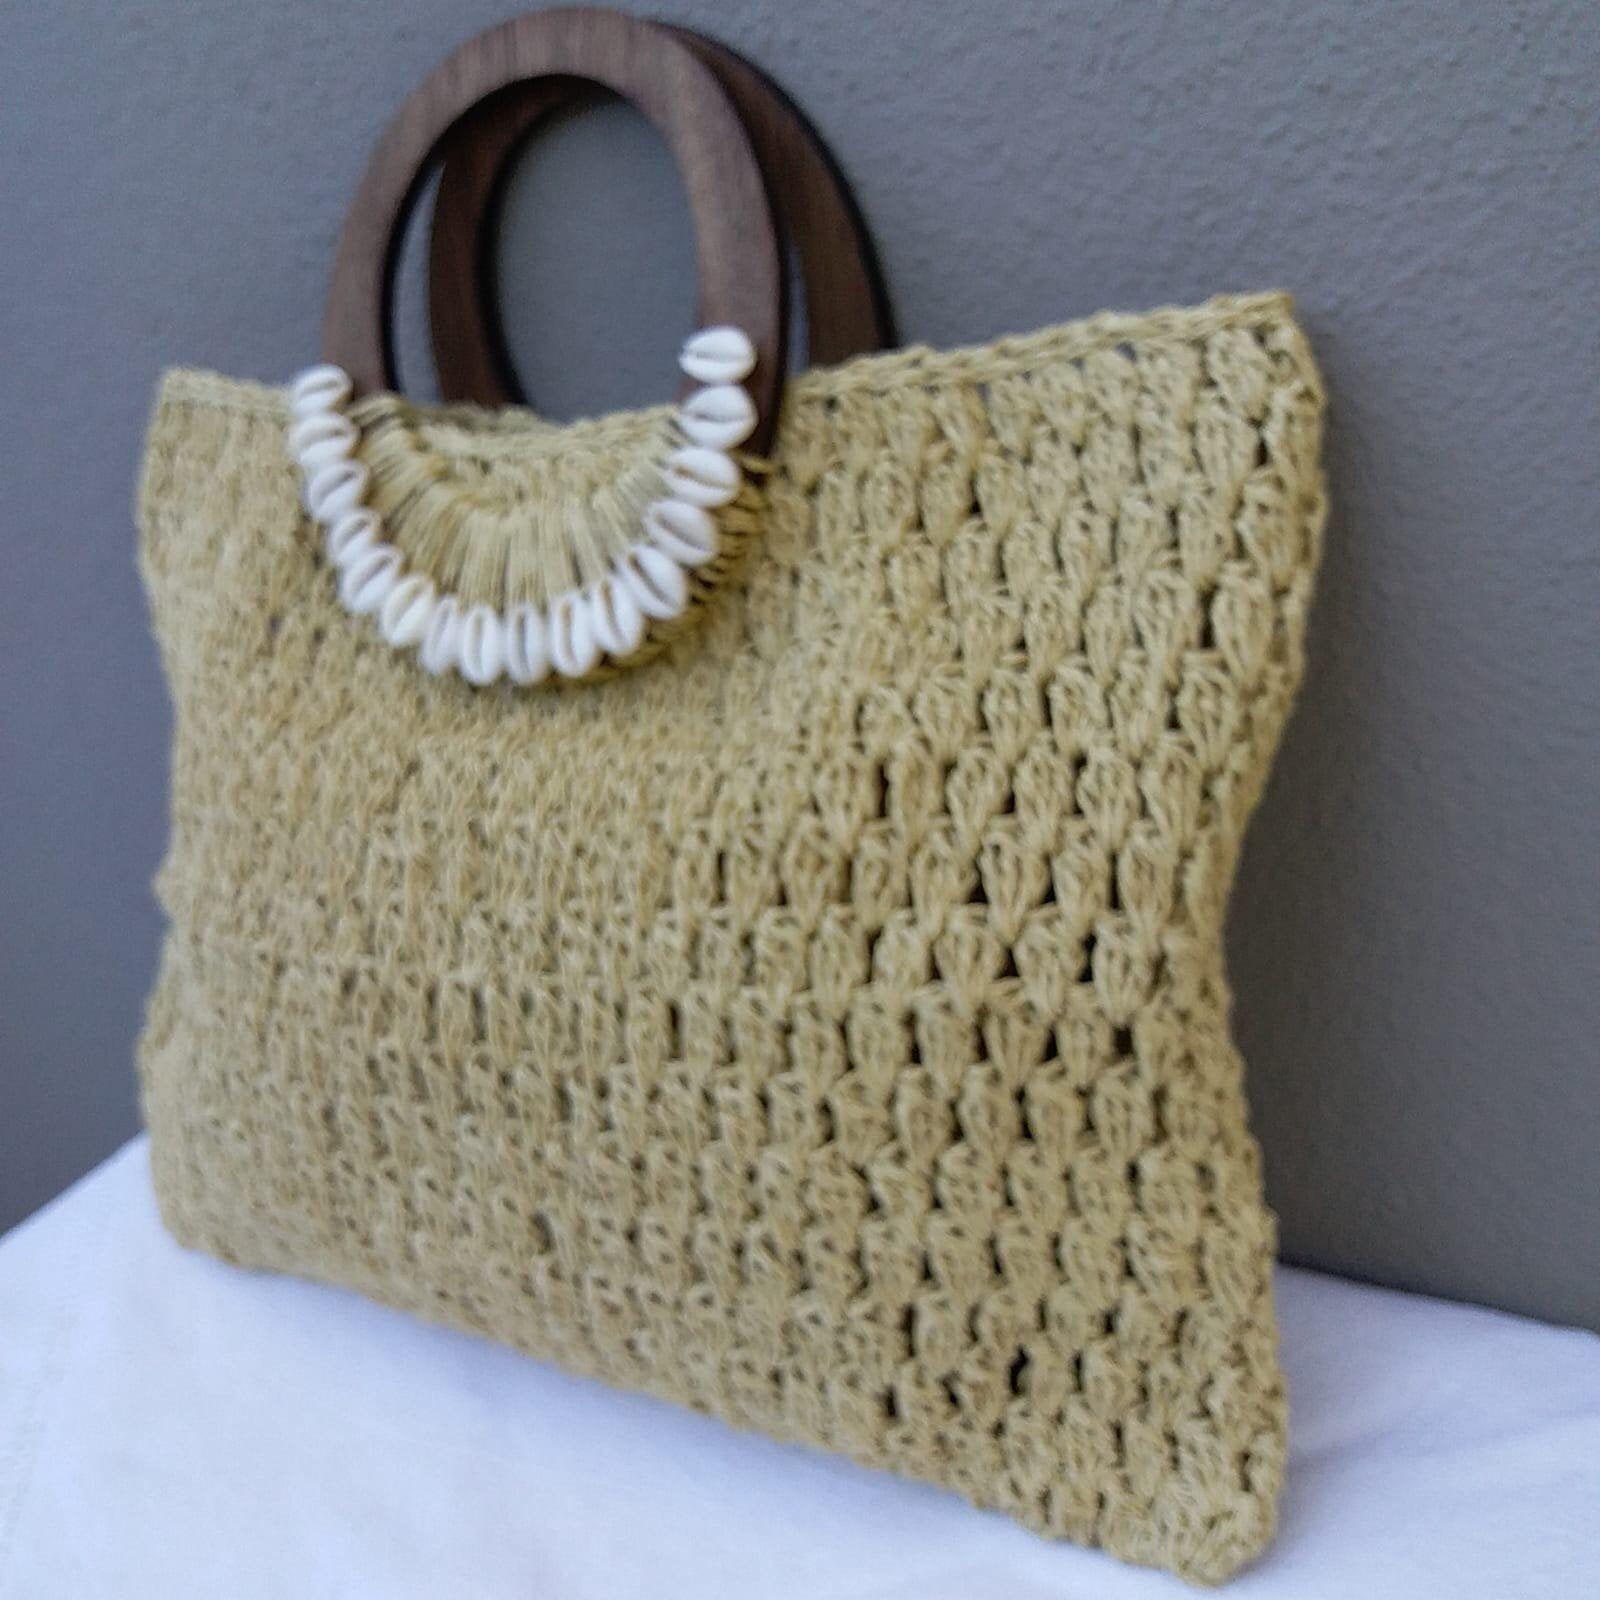 Crochet Shoulder Bag Everyday Large Purse Crochet Bag Handmade With Paperyarn Handmadebag With Wooden Handles